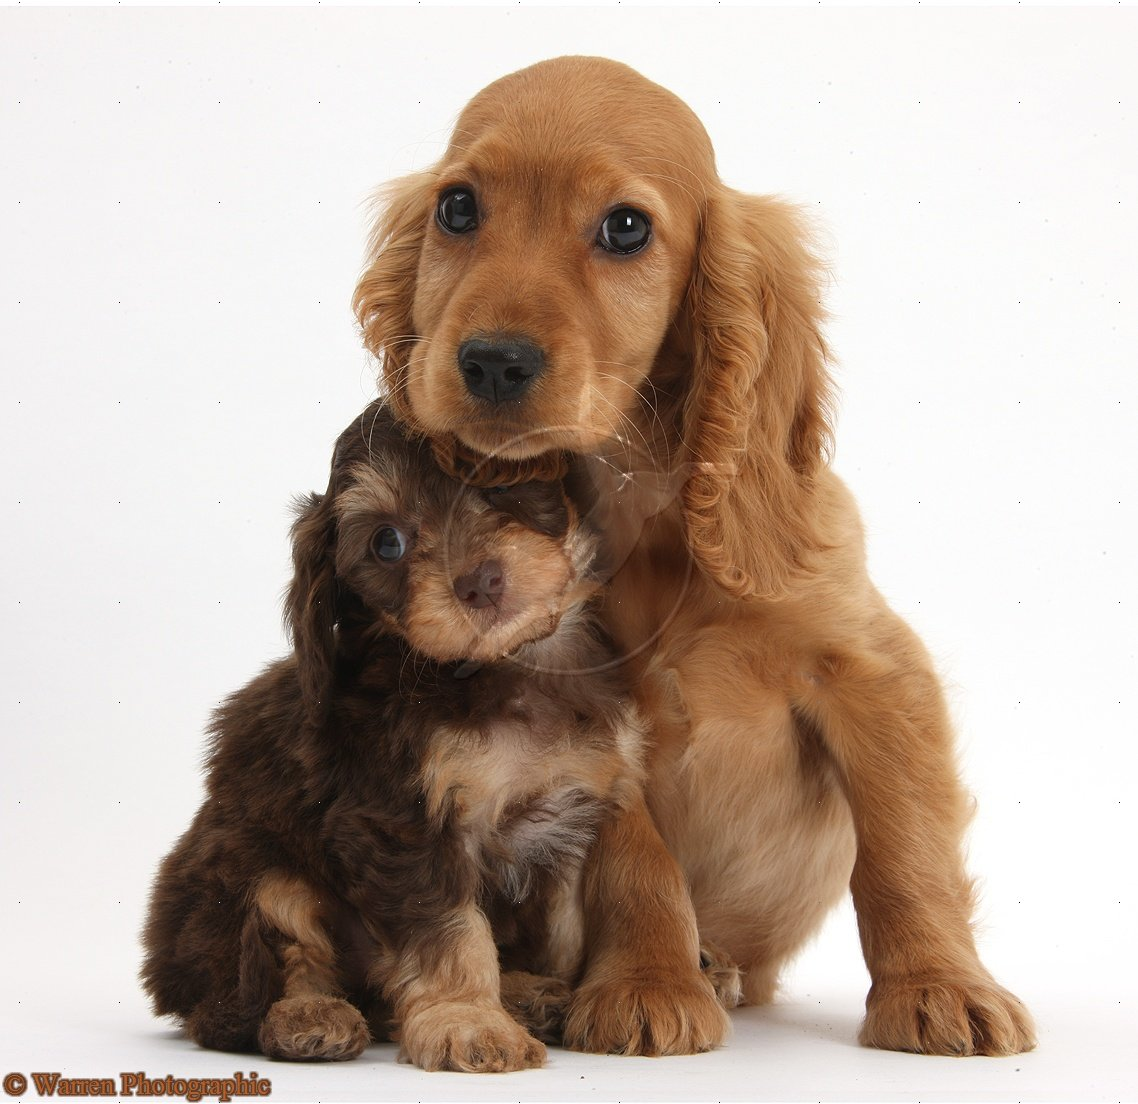 Cute Dogs: Cocker spaniel dog